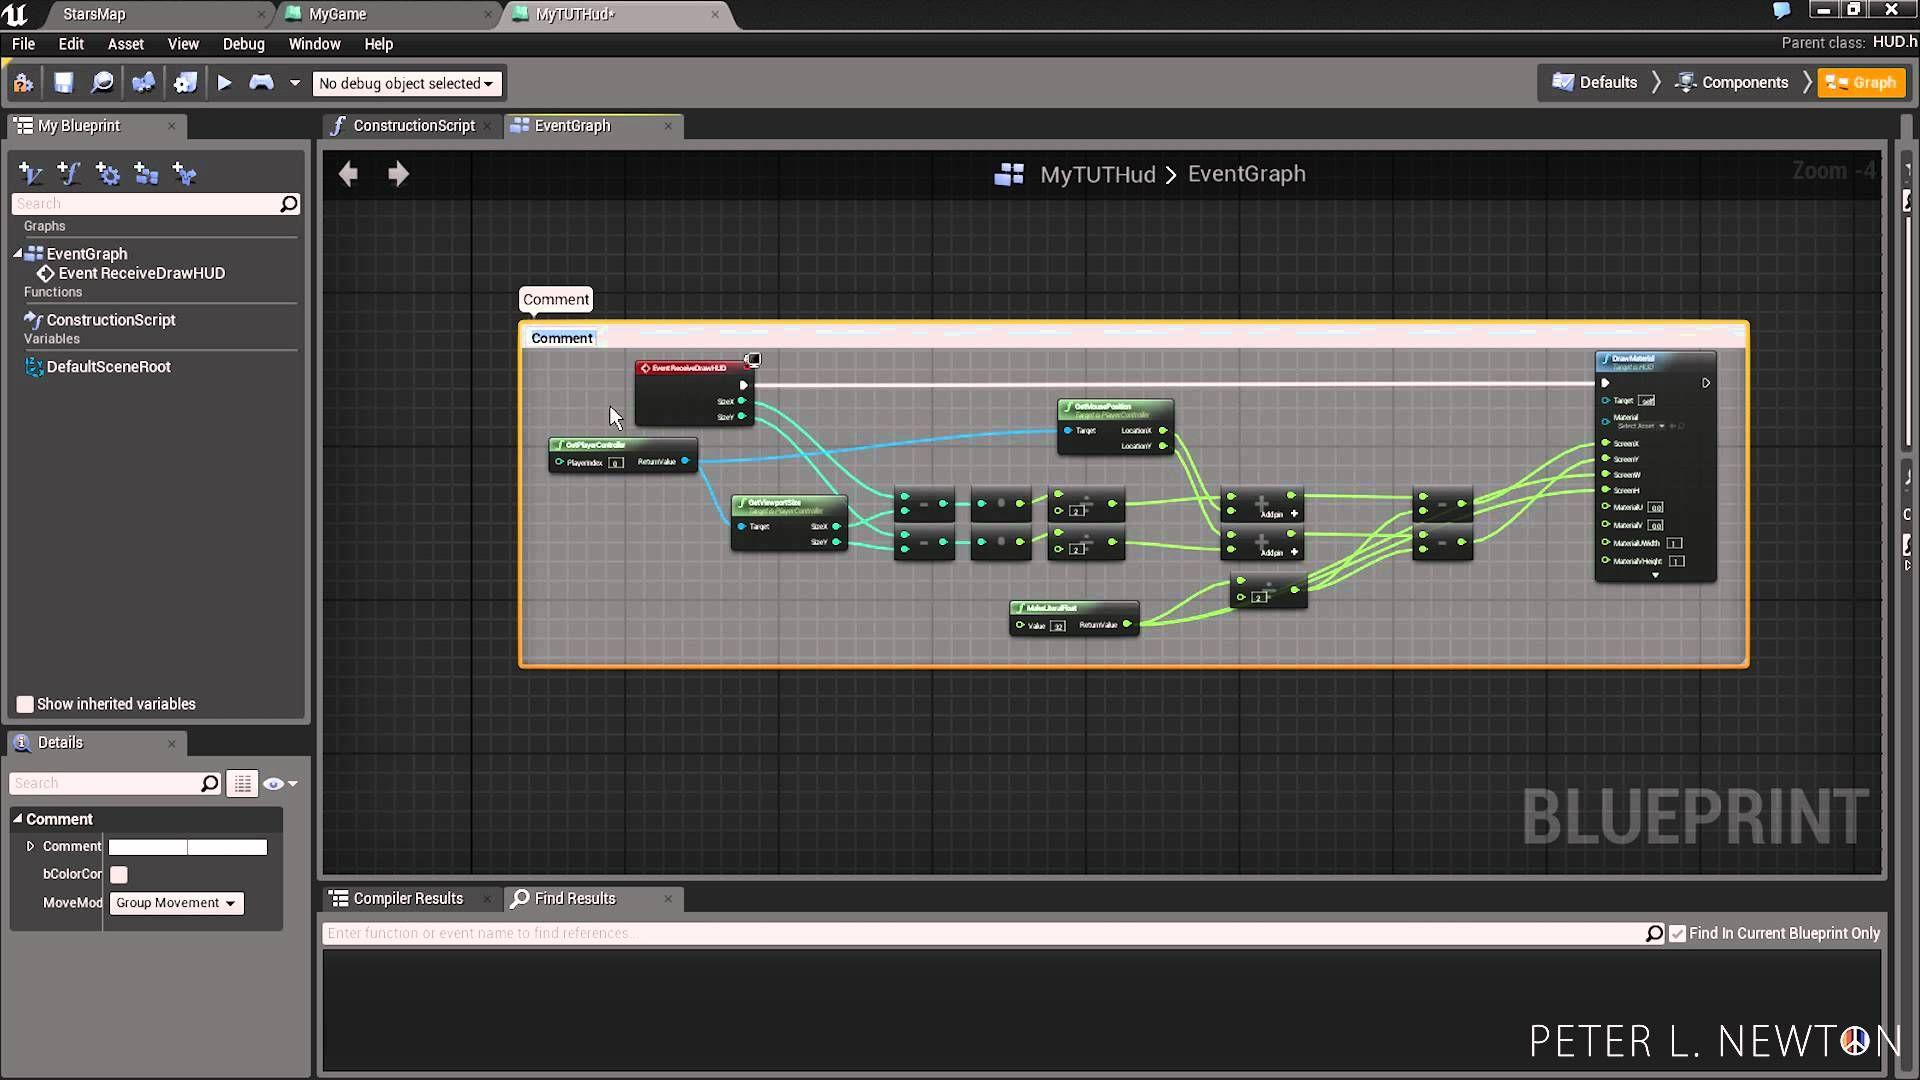 Blueprints how to create a custom cursor unreal engine 4 my blueprints how to create a custom cursor unreal engine 4 malvernweather Choice Image